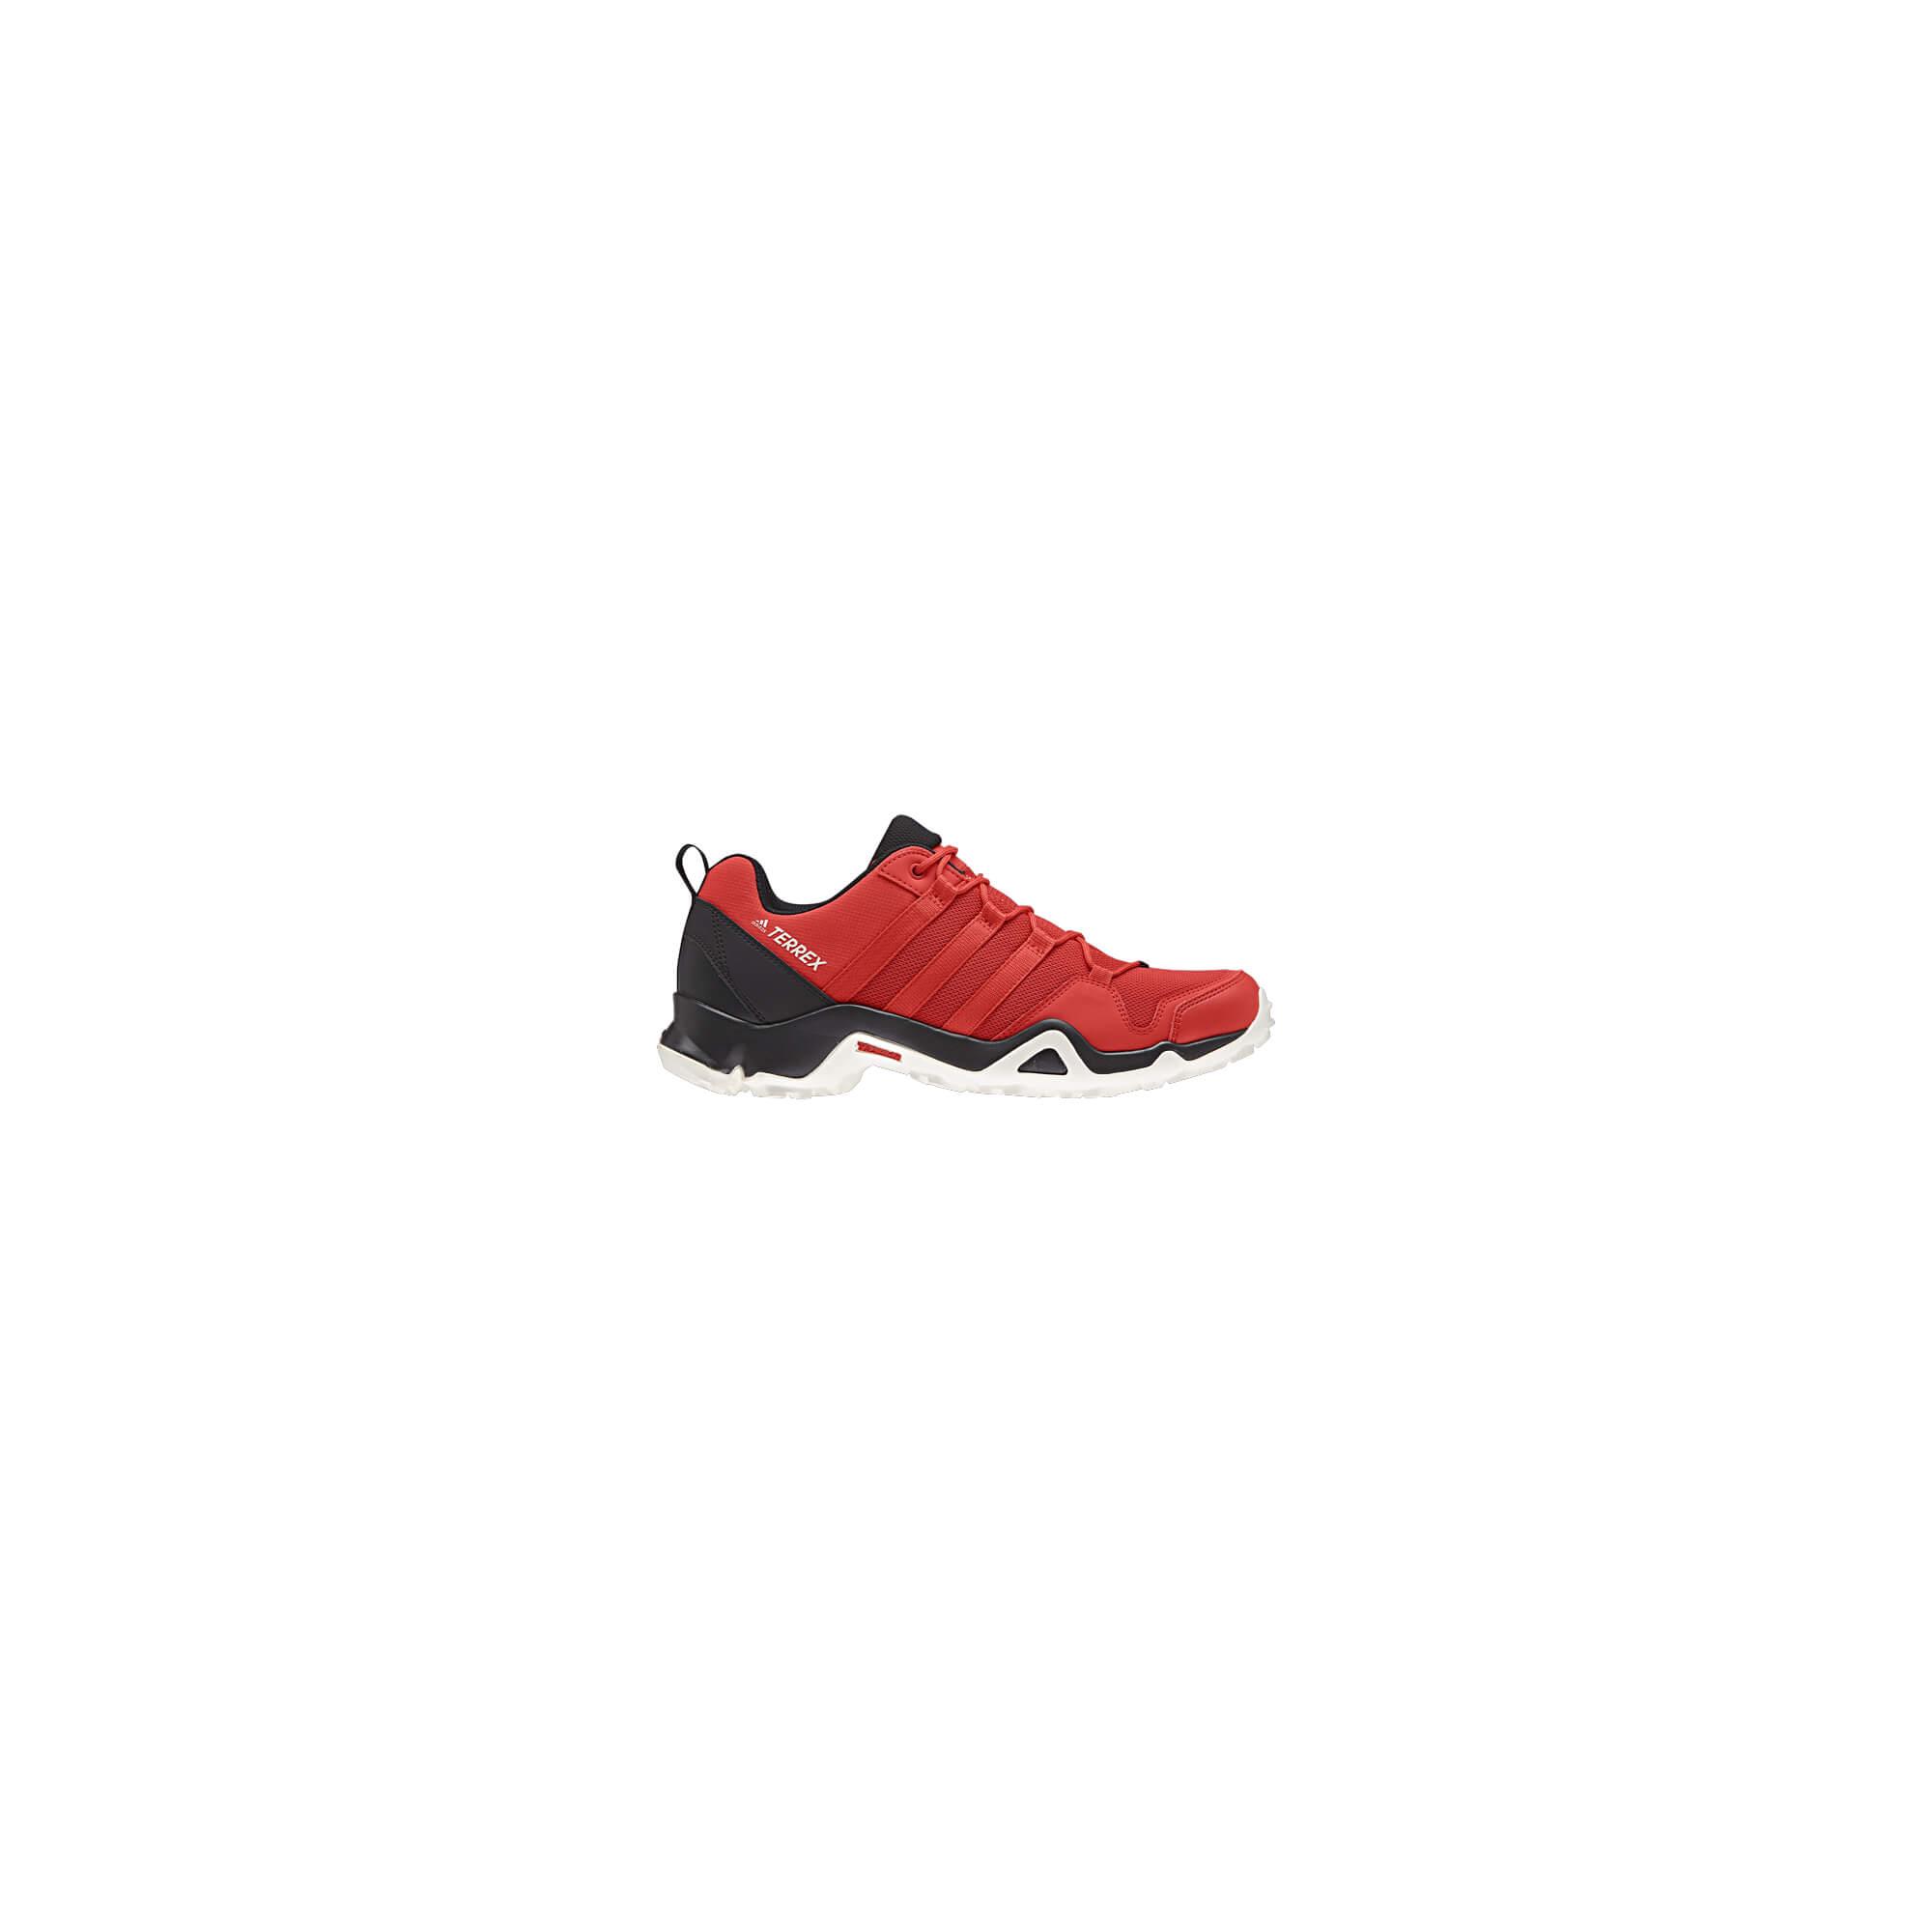 adidas Muska hiking obuca | CM7730 Crvena 41 13 TERREX